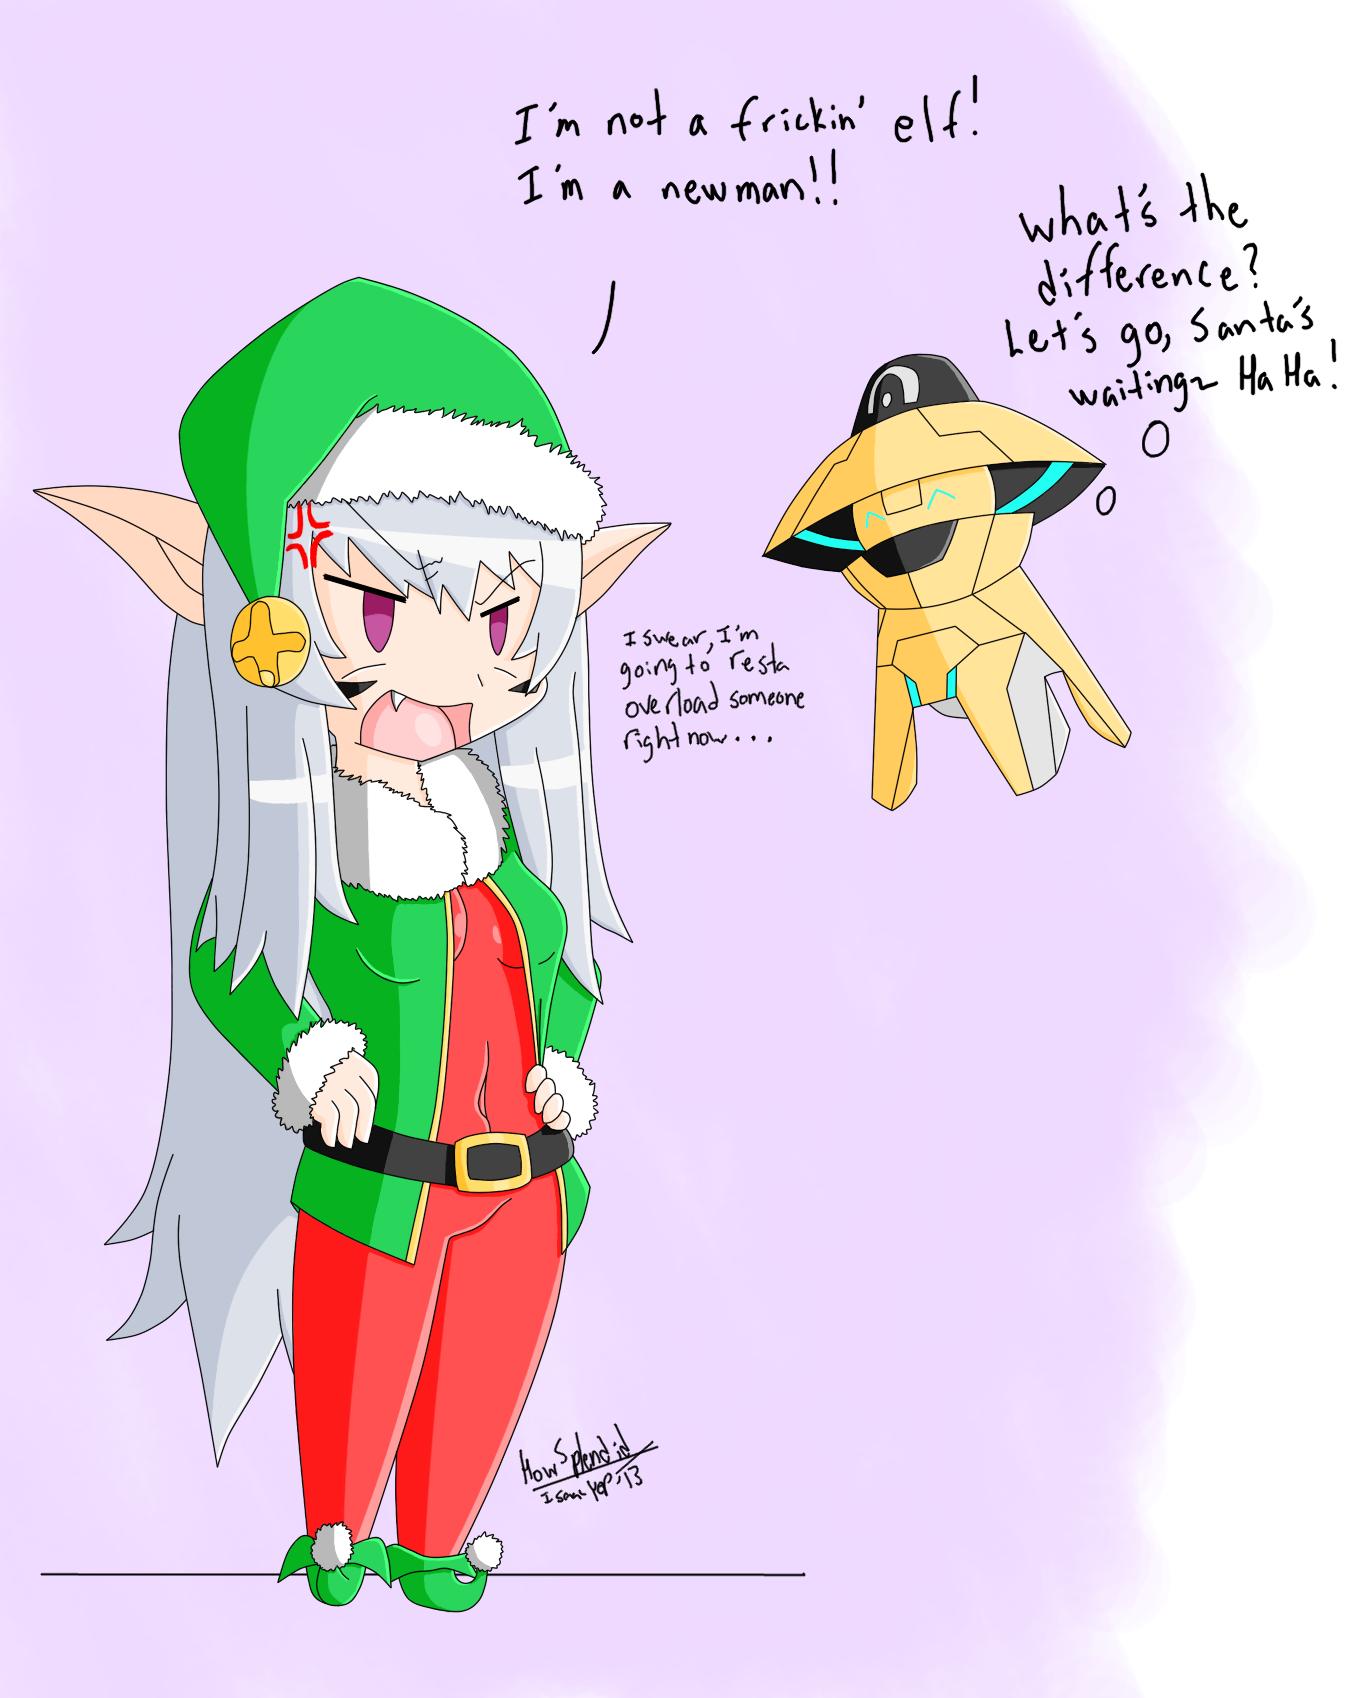 Christmas spirit colored